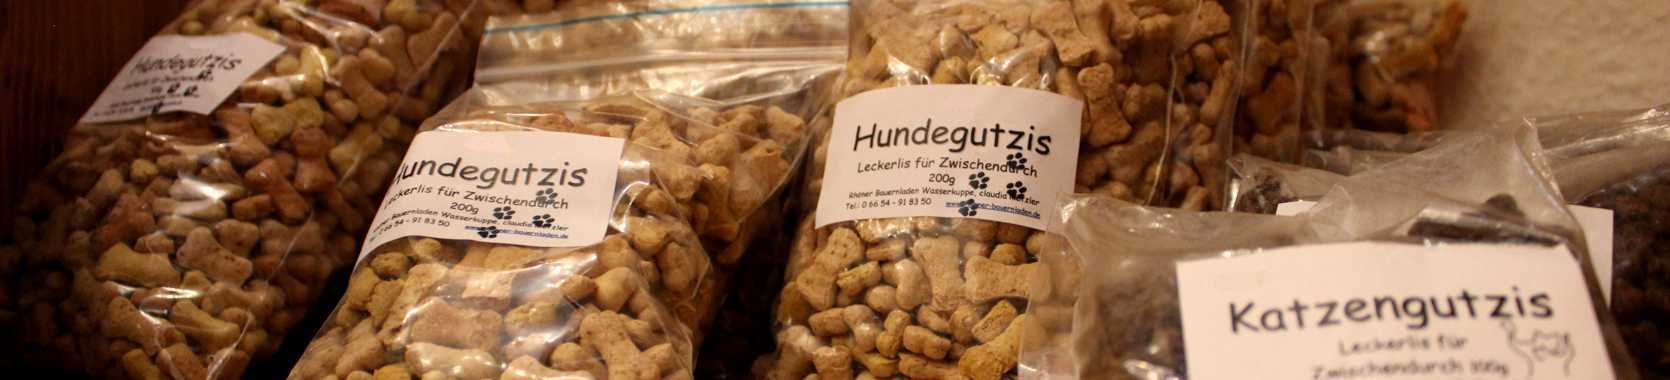 Rhoener_Hundegutzis_header